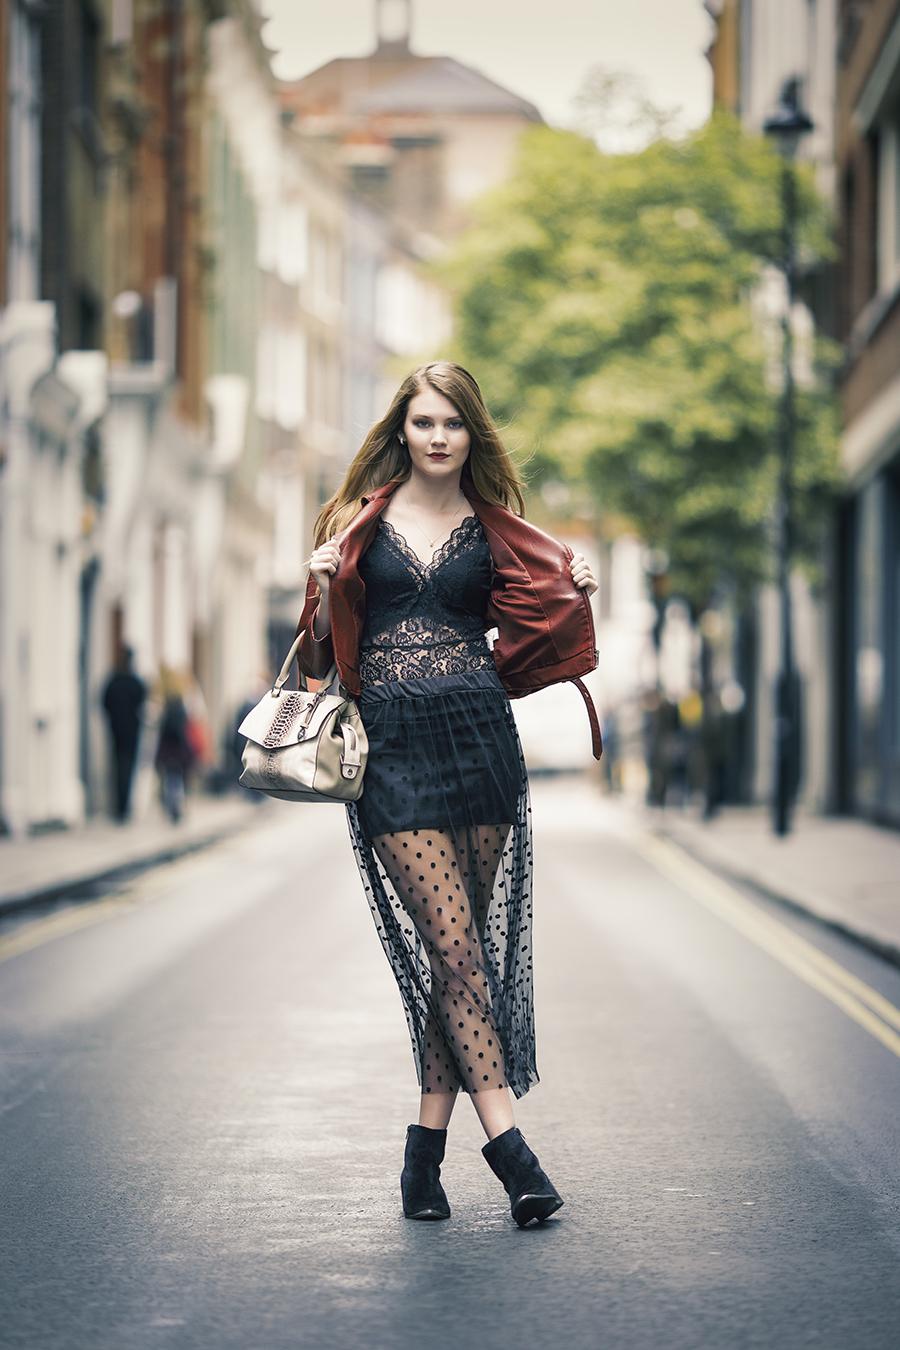 Street fashion / Photography by StephenJ, Model Chloe. / Uploaded 30th July 2017 @ 02:46 PM